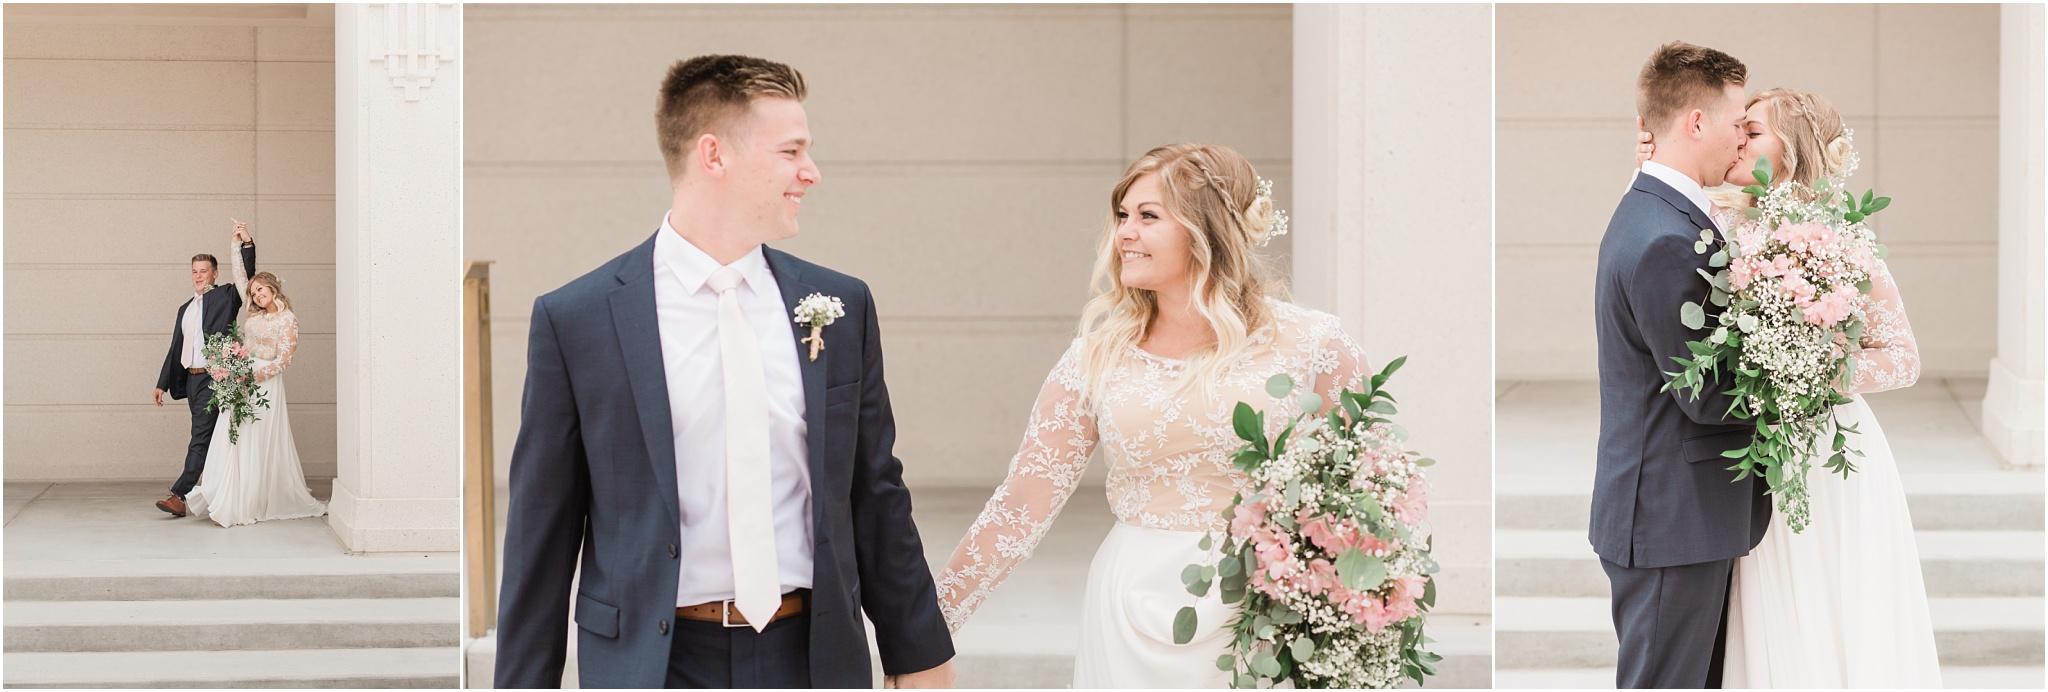 Wedding Photography_Meridian Idaho Temple_Boise Idaho_Nampa Idaho_Leah Southwick Photography_0032.jpg